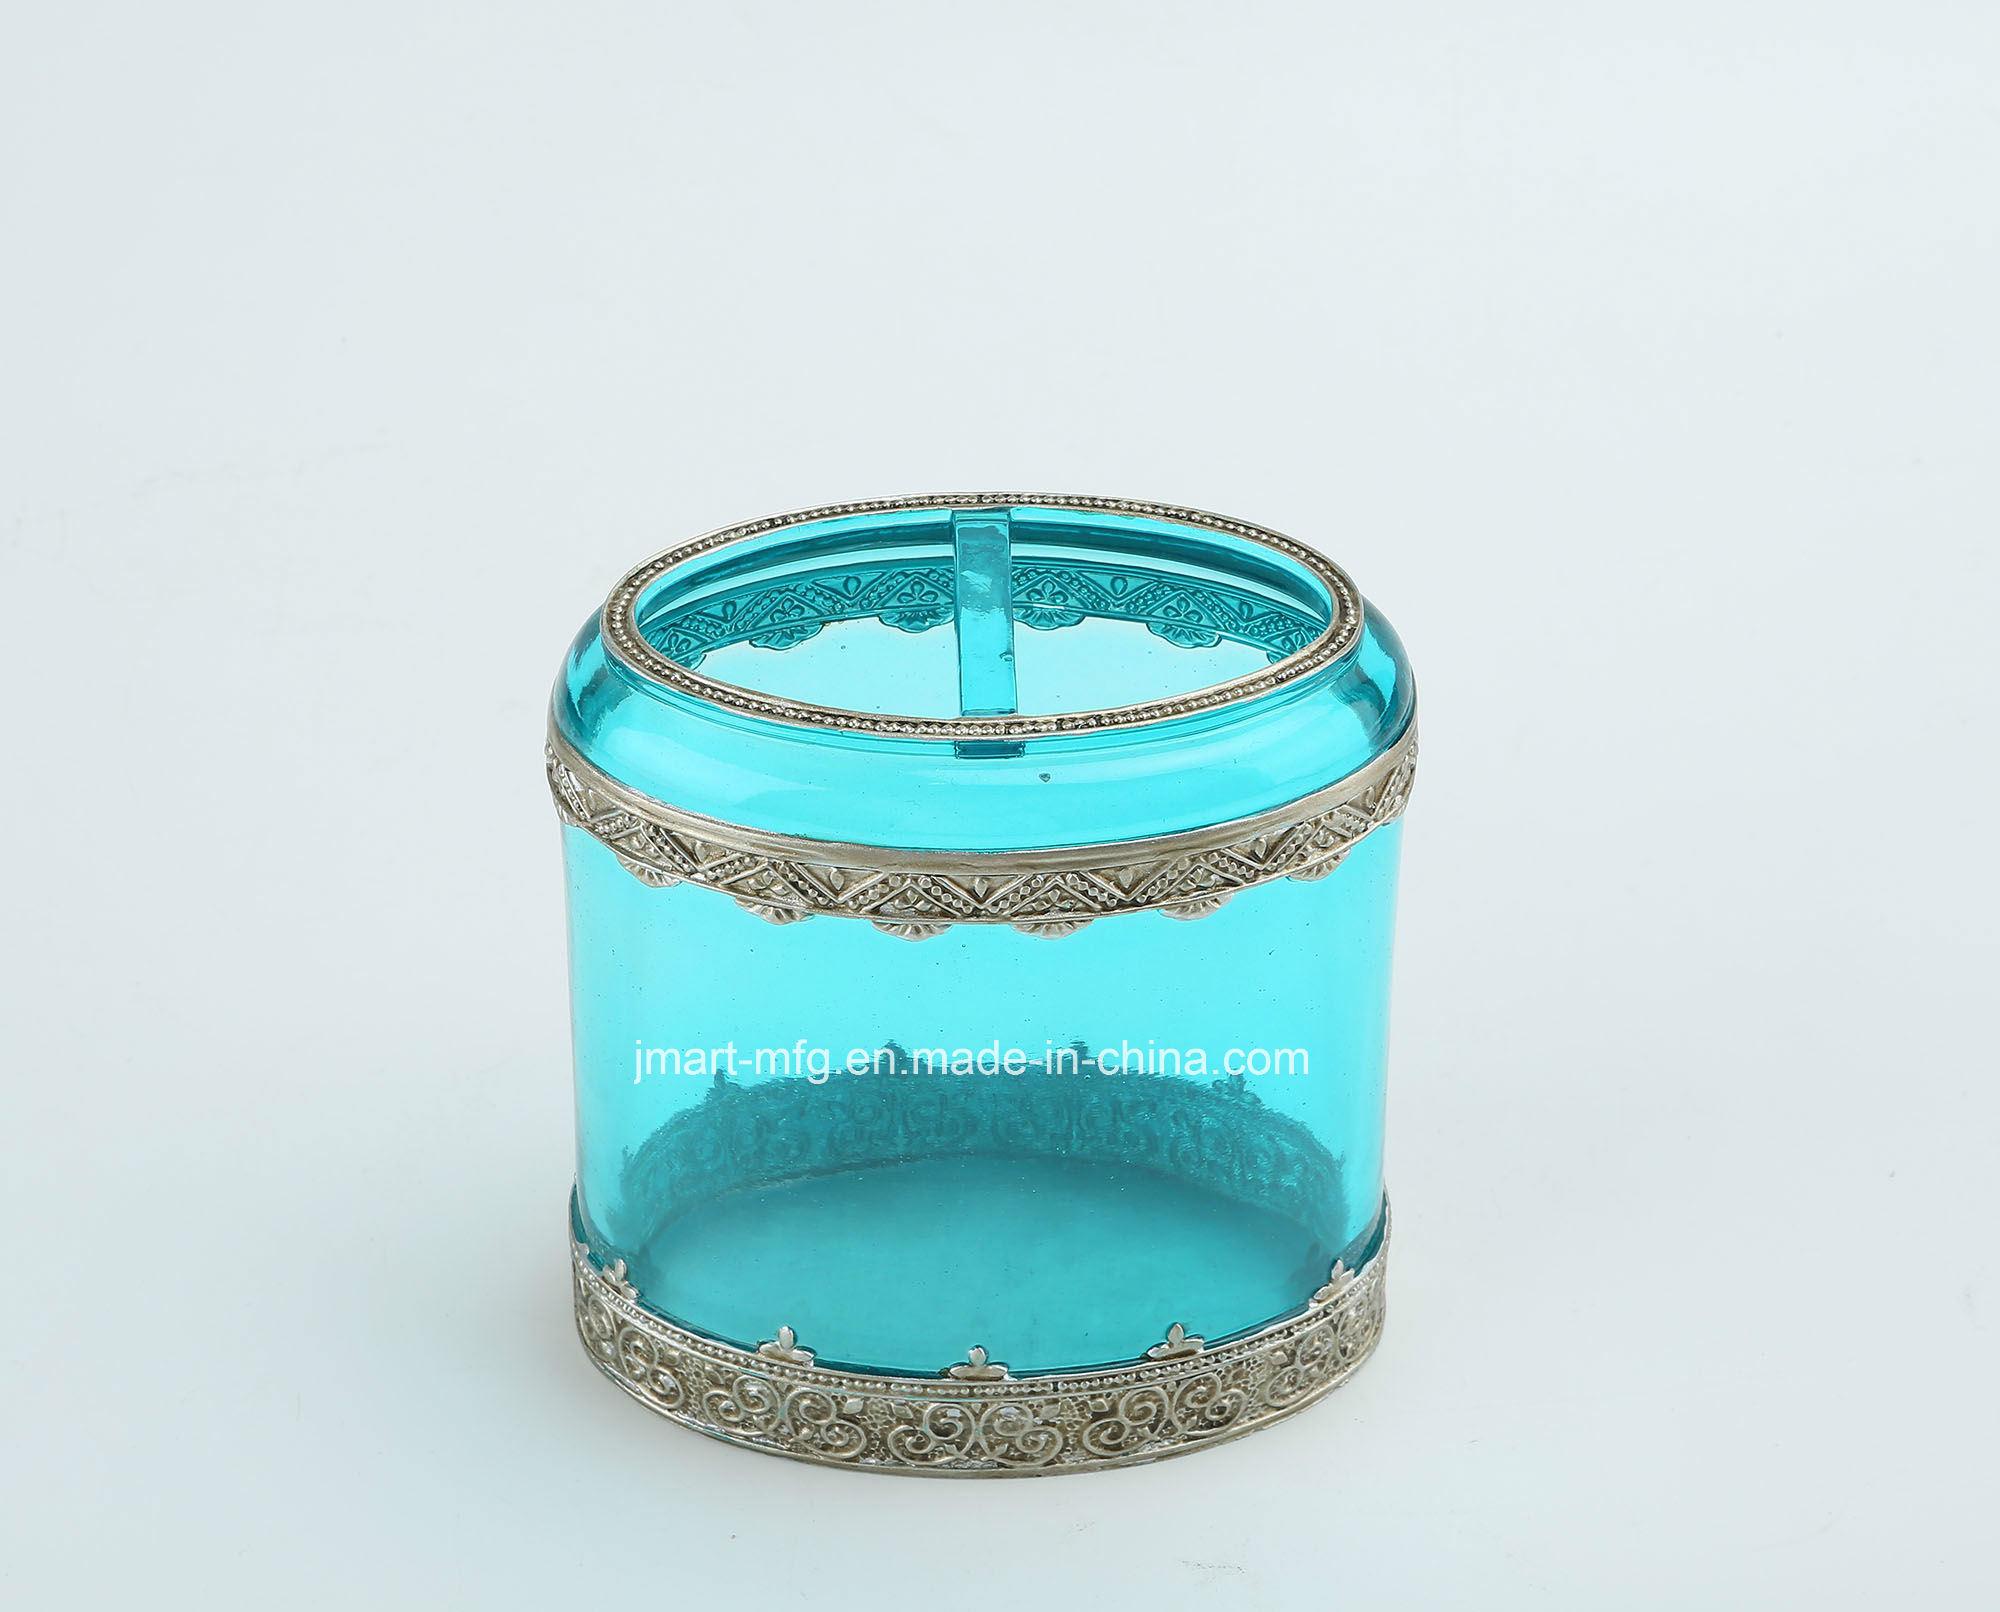 Metallic Hand Paint Super Clear Polyresin Bathroom Accessory